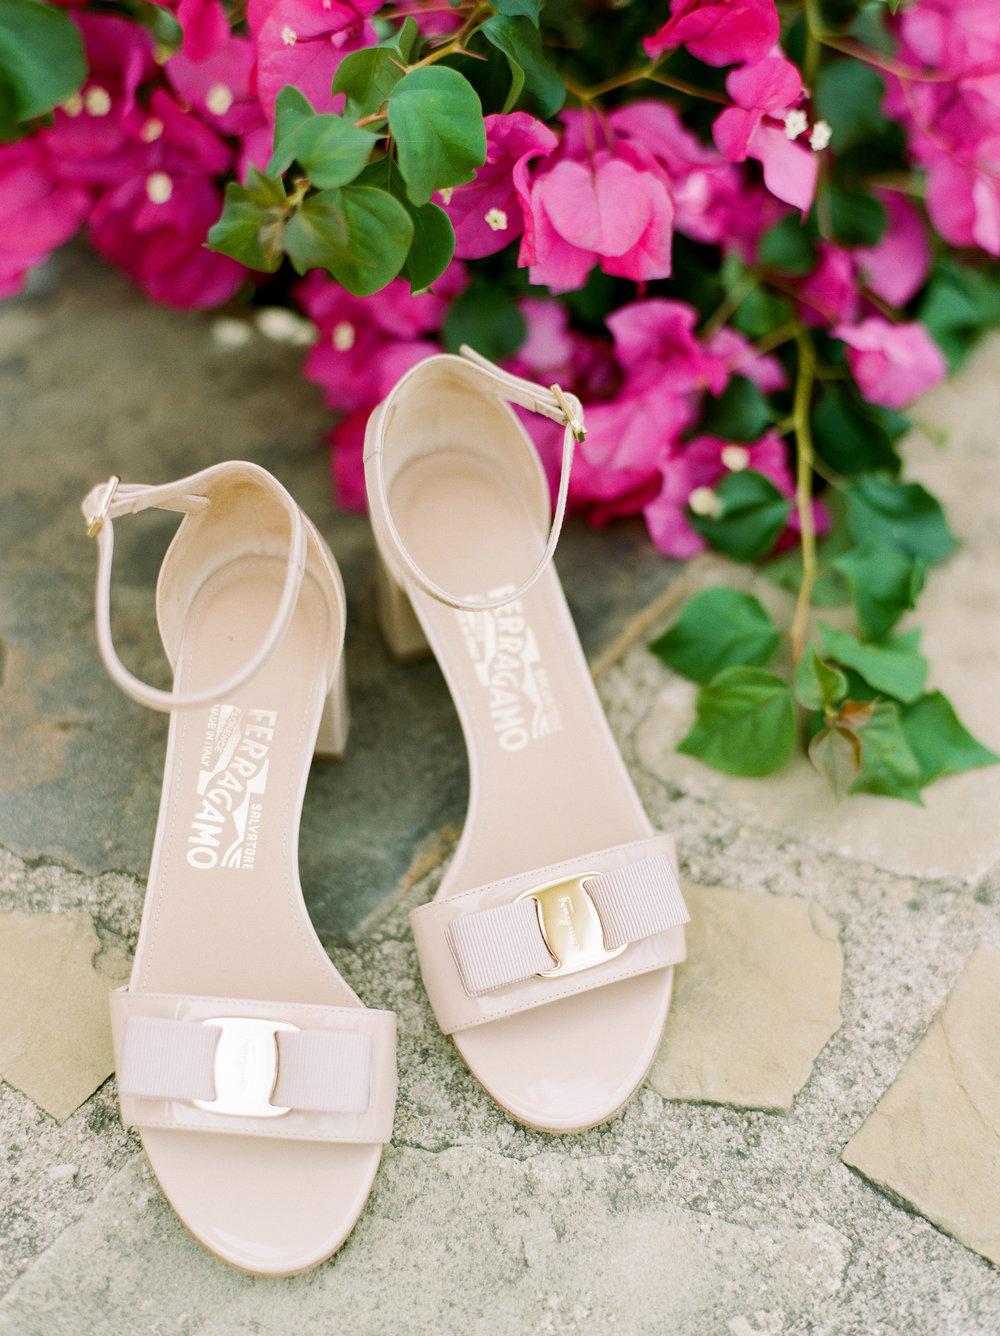 Escondido-Golf_Lake-Club-Hill-Country-Houston-Wedding-Photographer-Best-Top-Luxury-Destination-Engagements-Portrait-Austin-Photography-18.jpg